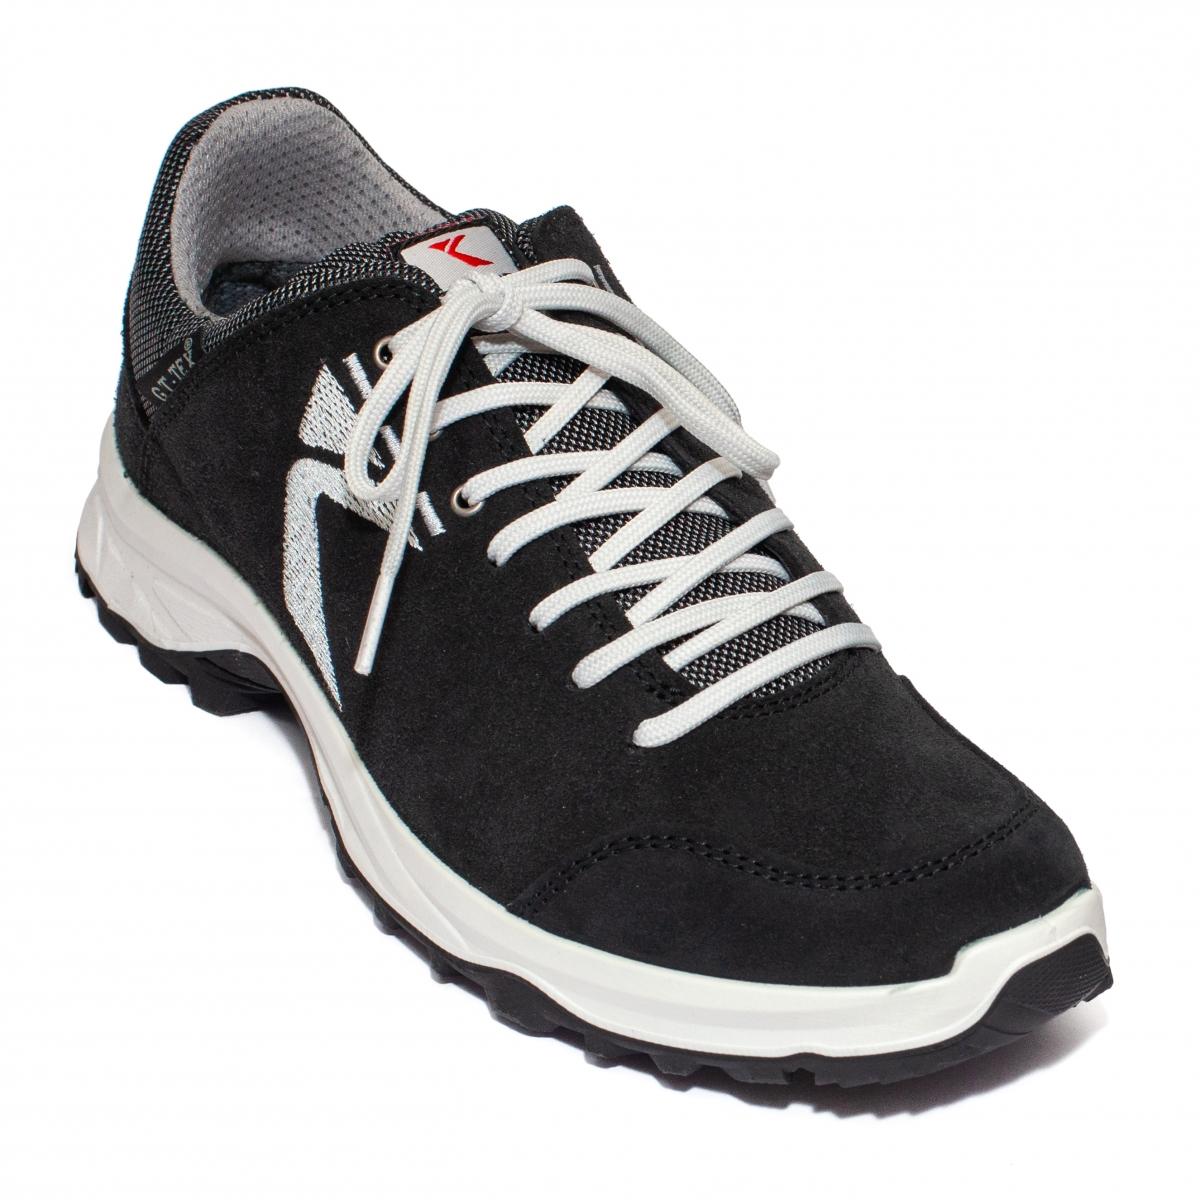 Pantofi impermeabili Park Tex negru 36-45